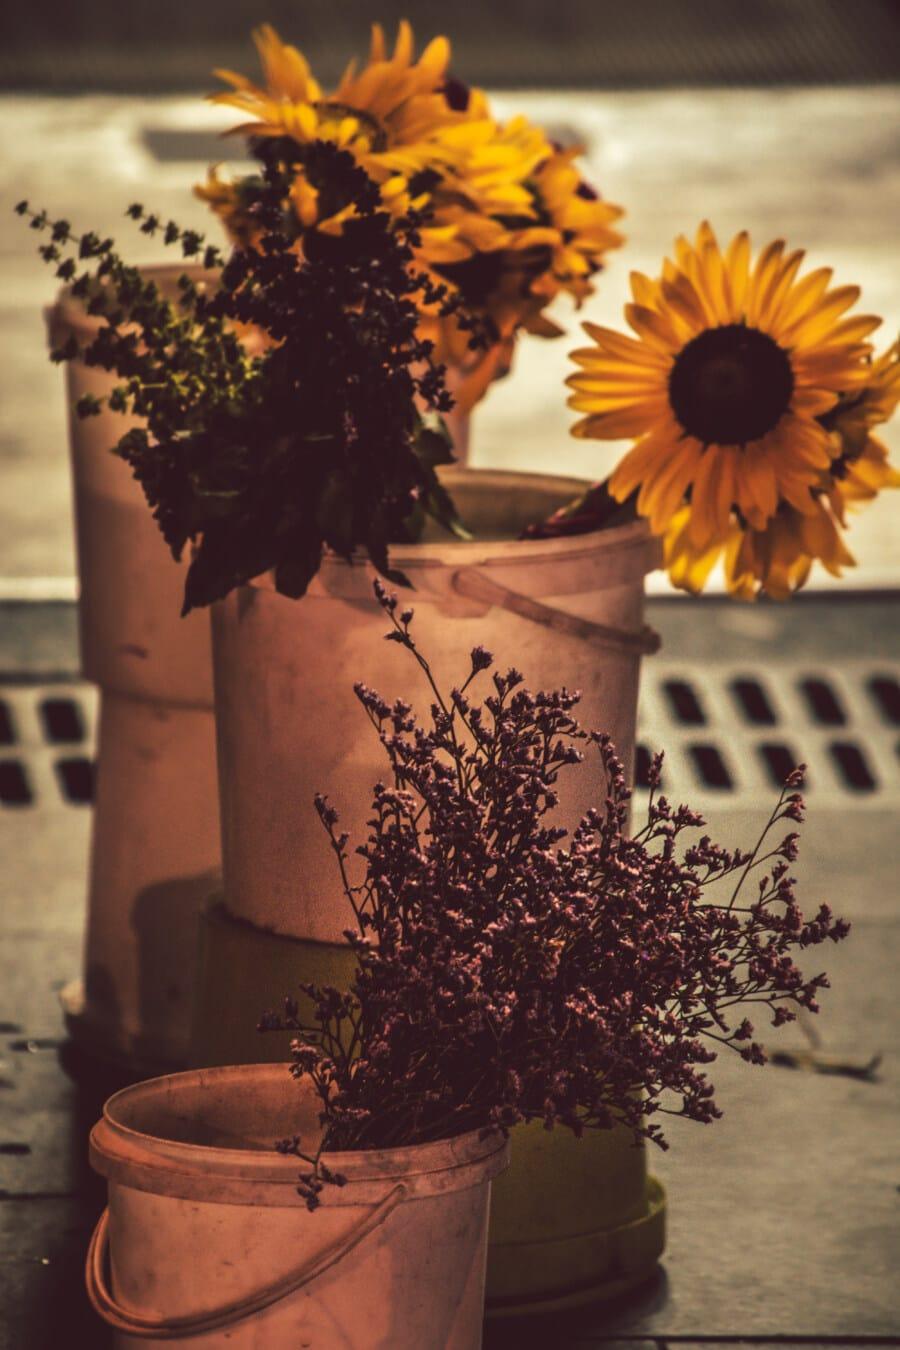 Jahrgang, Kunststoff, Eimer, Still-Leben, Sonnenblume, Blumen, trocken, Vase, Glas, Natur